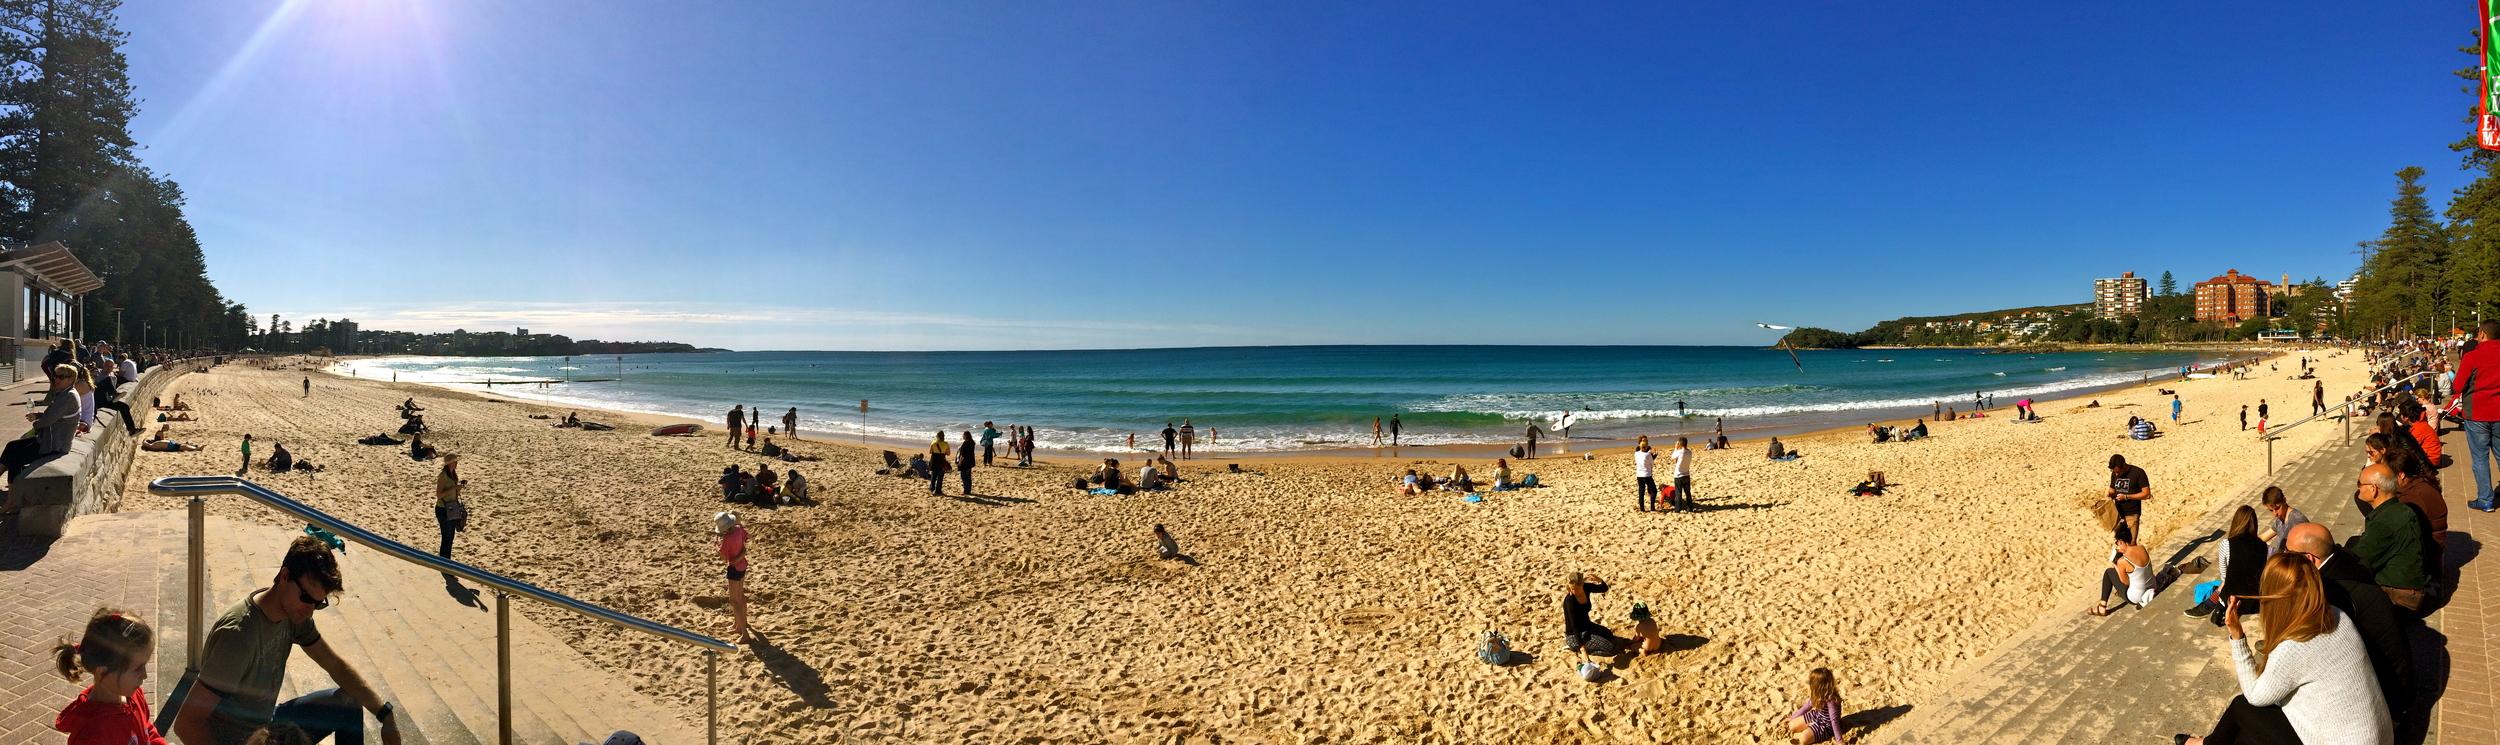 ◆ Manly beach